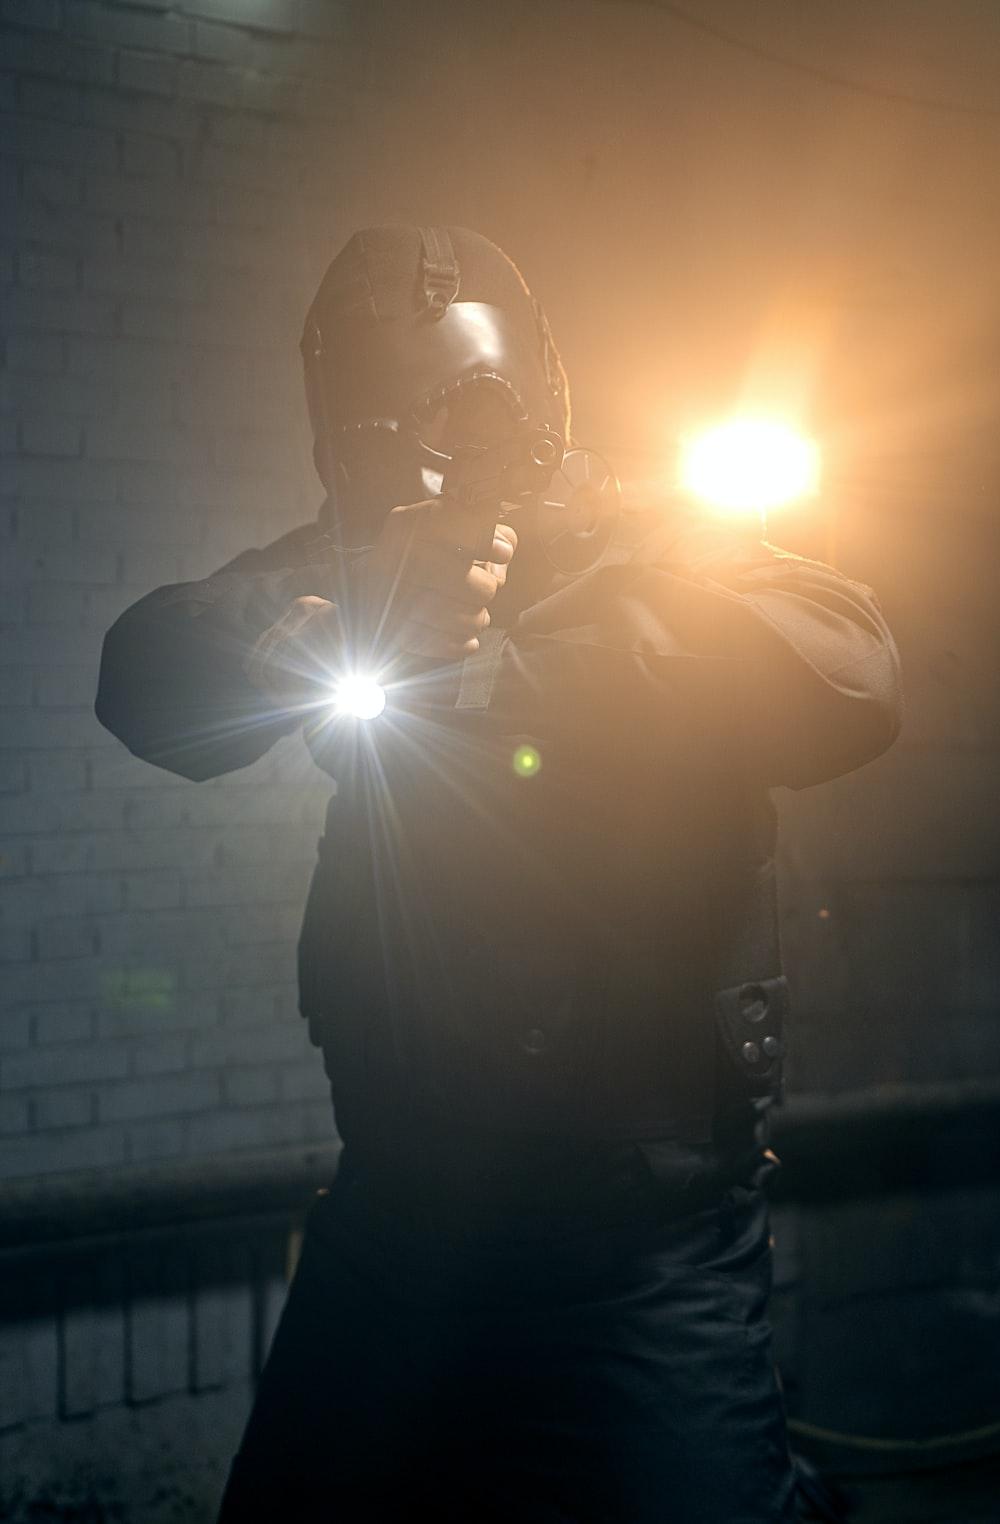 man in black jacket taking selfie